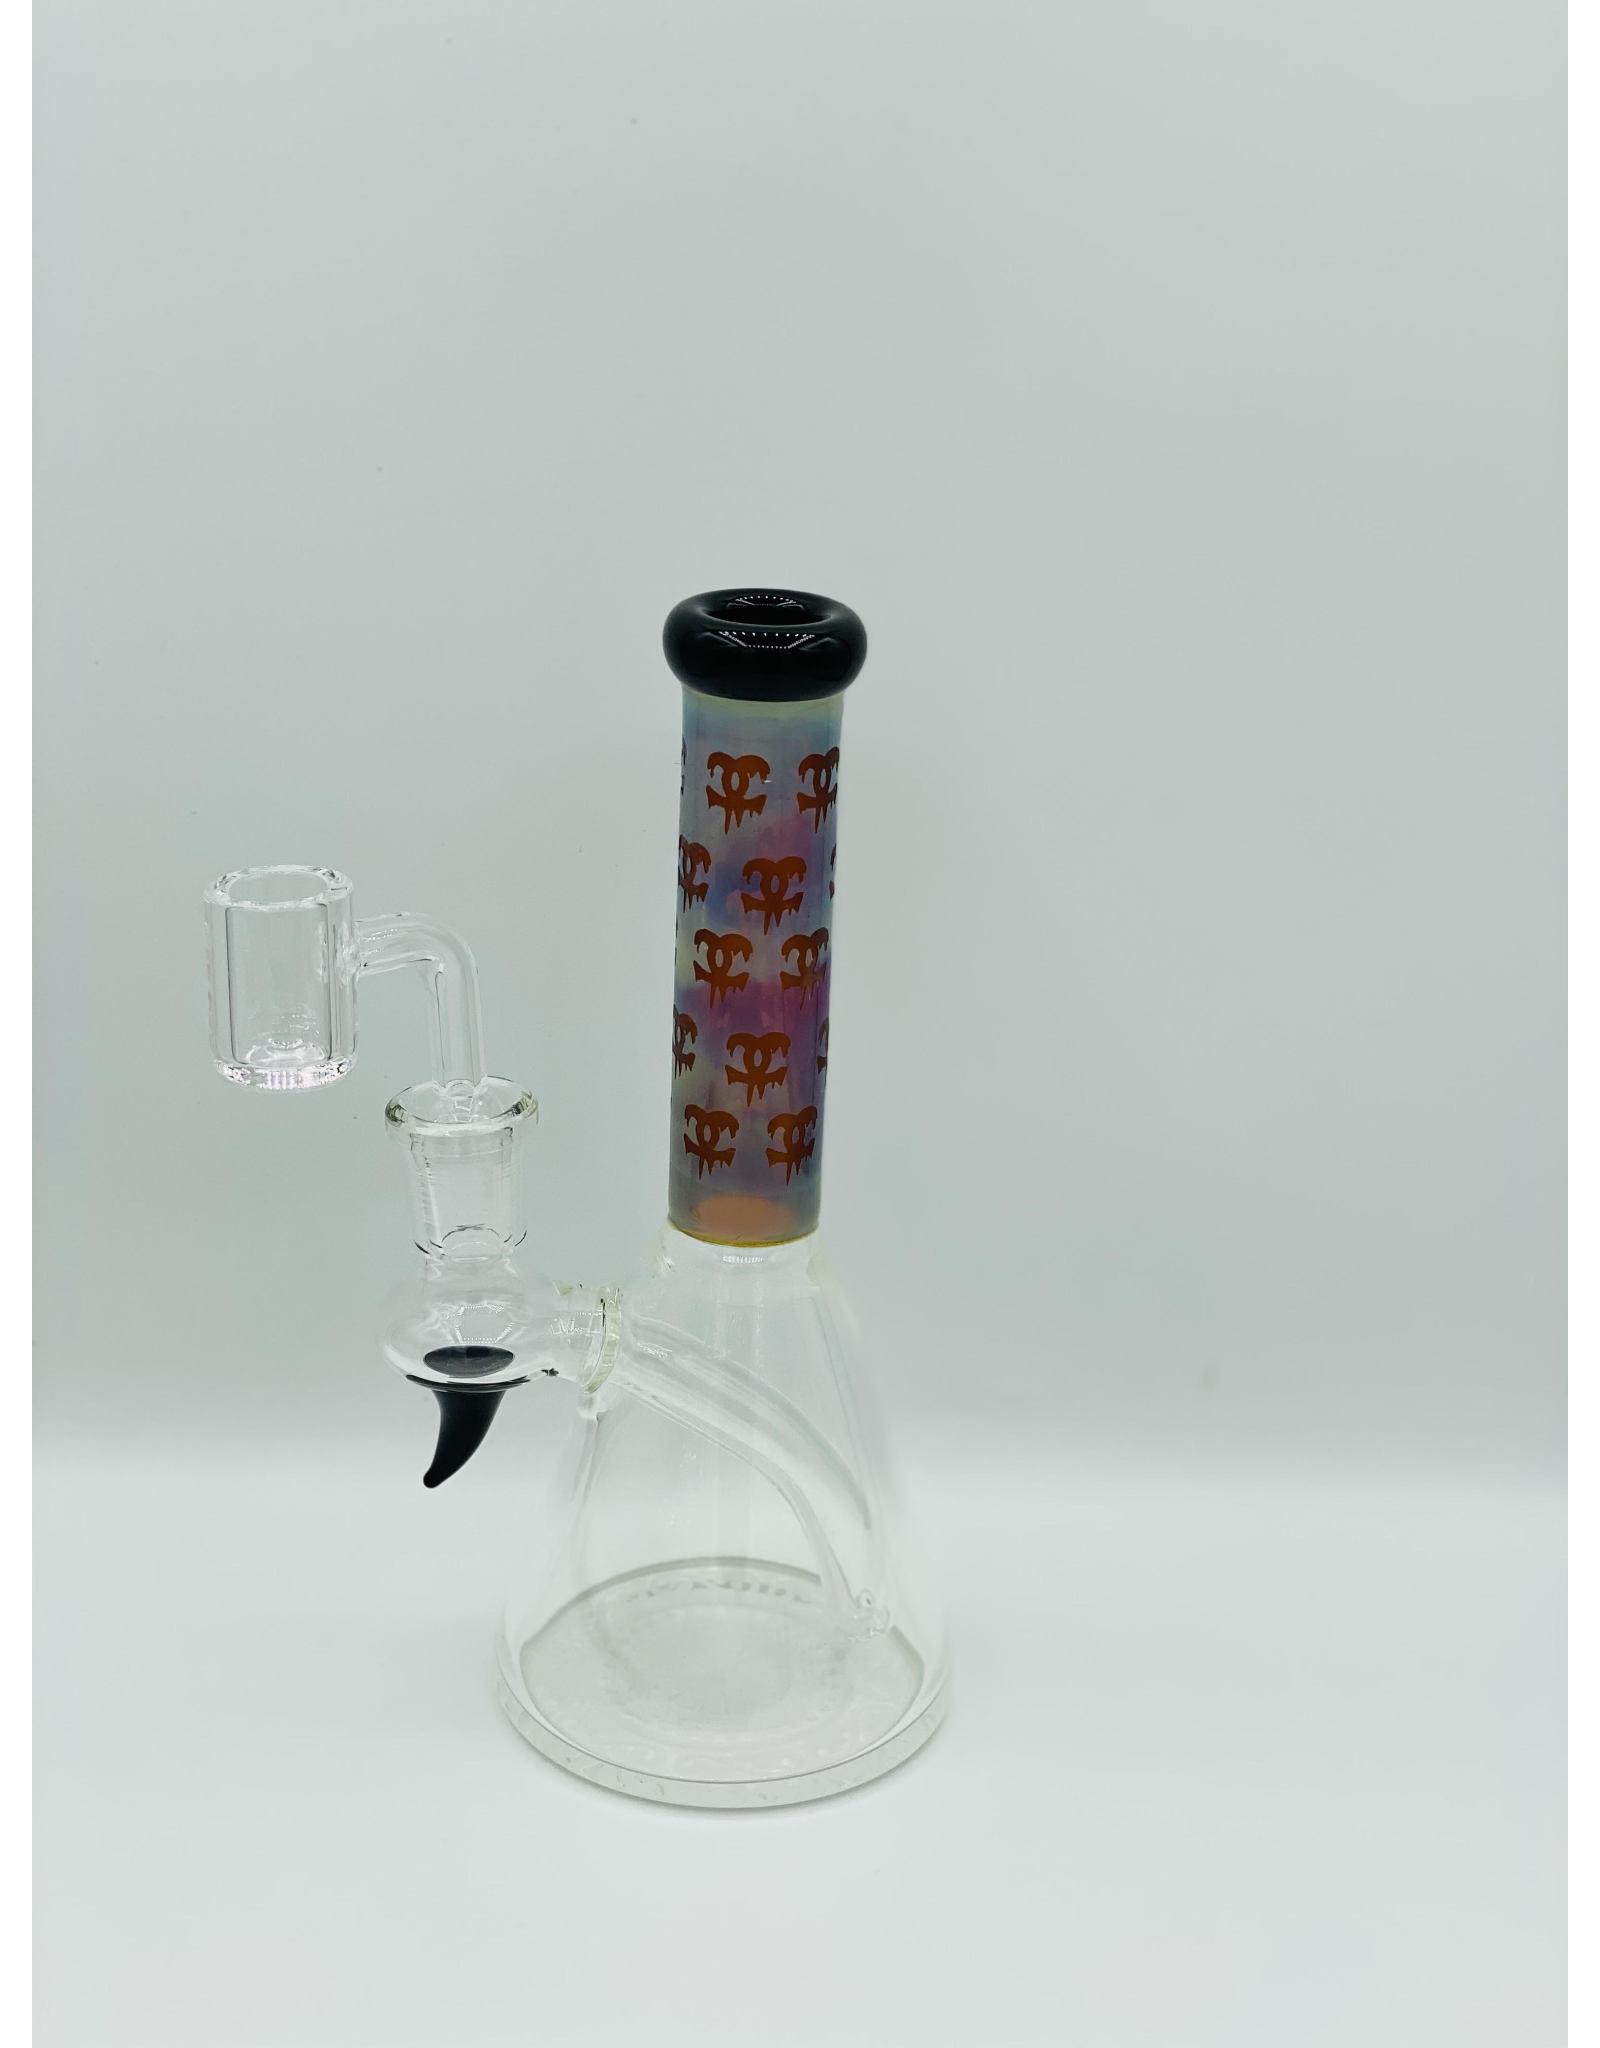 CHRYSTAL GLASS CRYSTAL GLASS 6.7 DAP RIG C6244